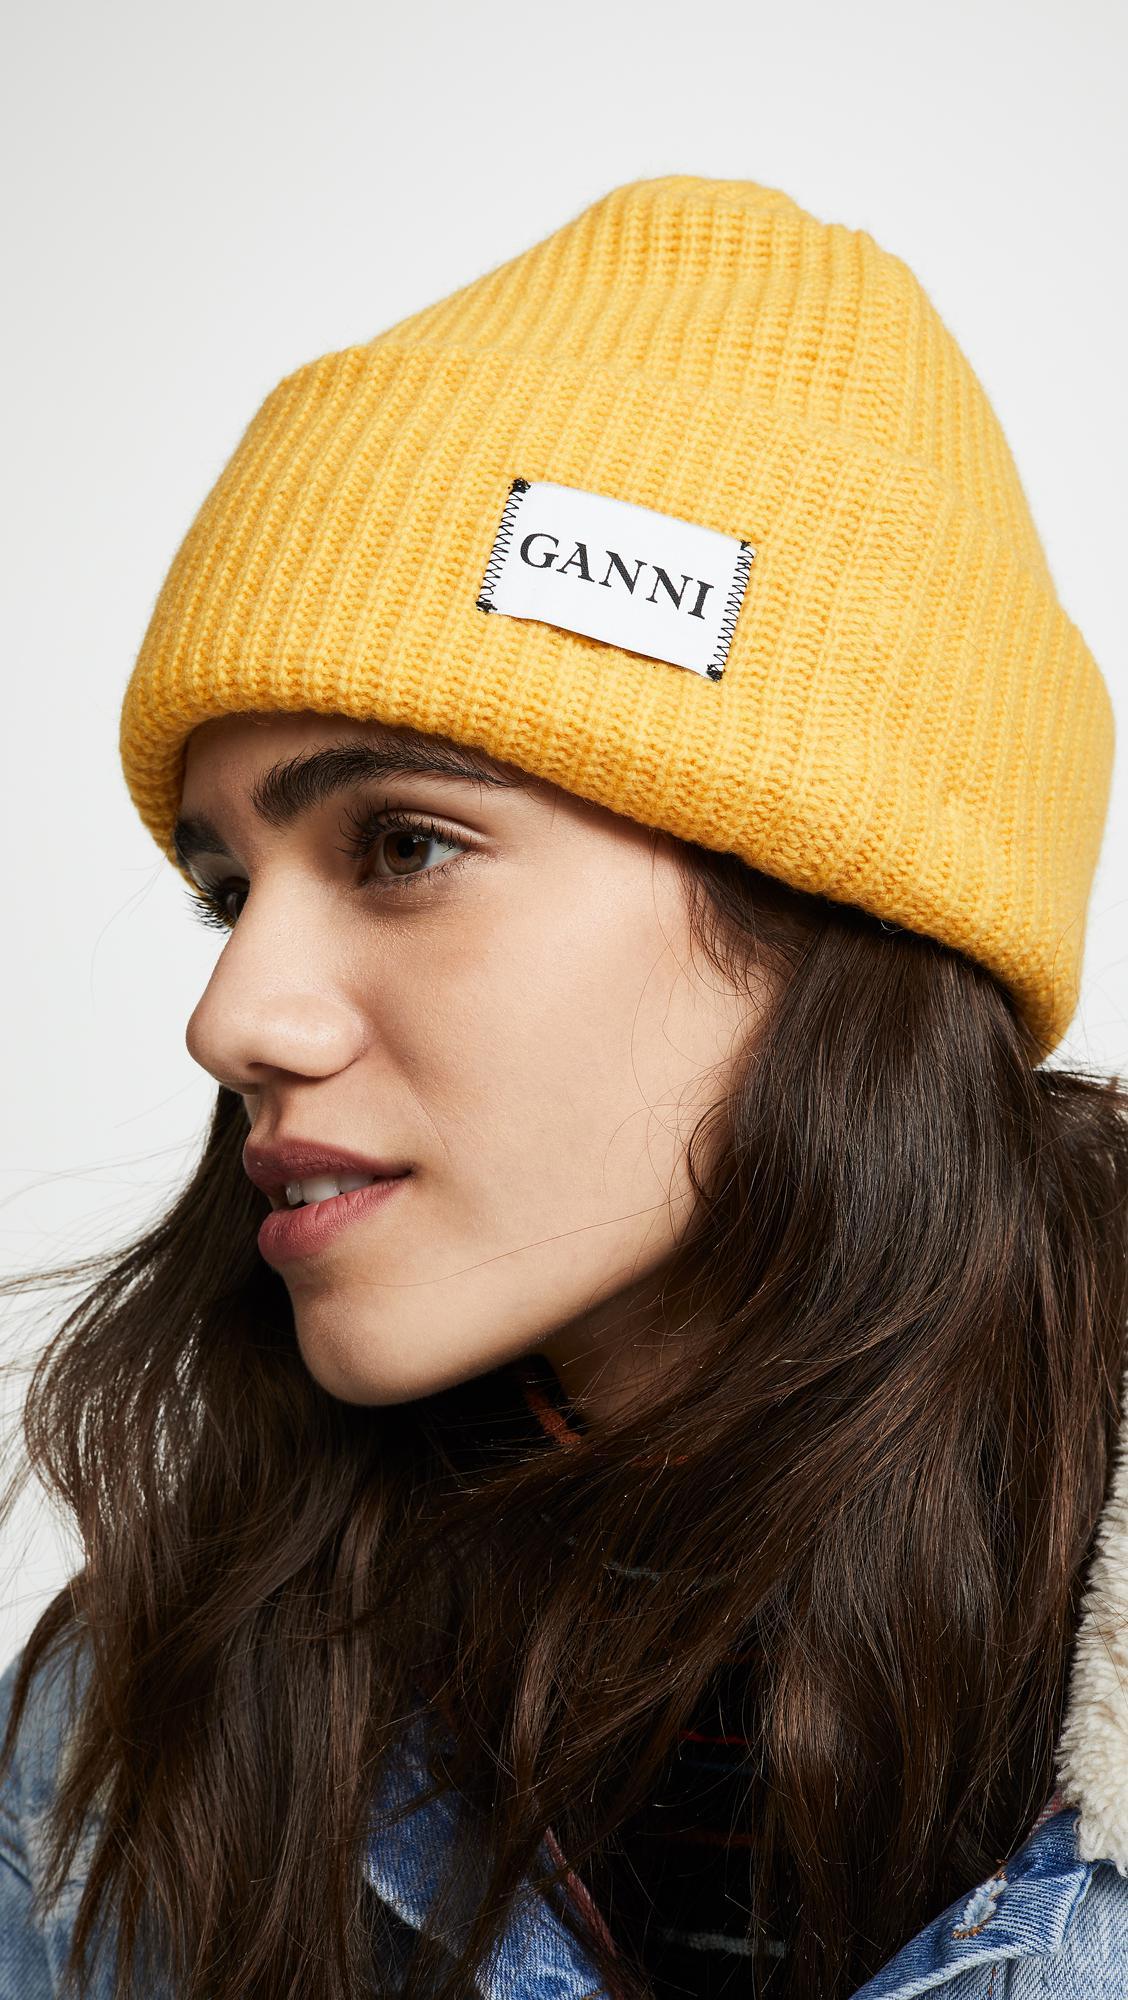 Lyst - Ganni Hatley Knit Hat in Yellow 6c7e978903f5